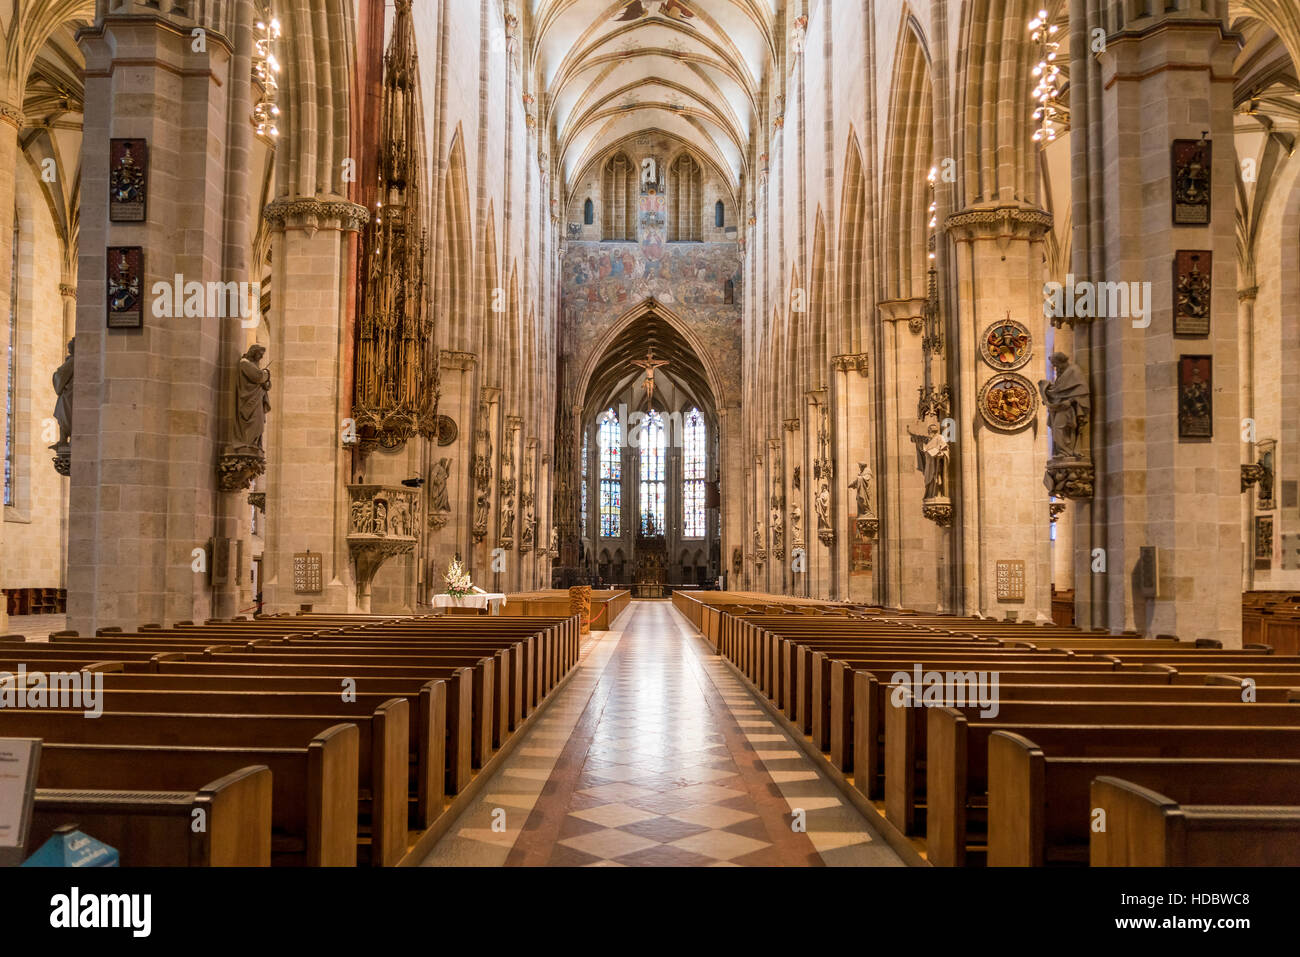 Interior of Ulm Minster, Ulm, Baden-Württemberg, Germany Stock Photo